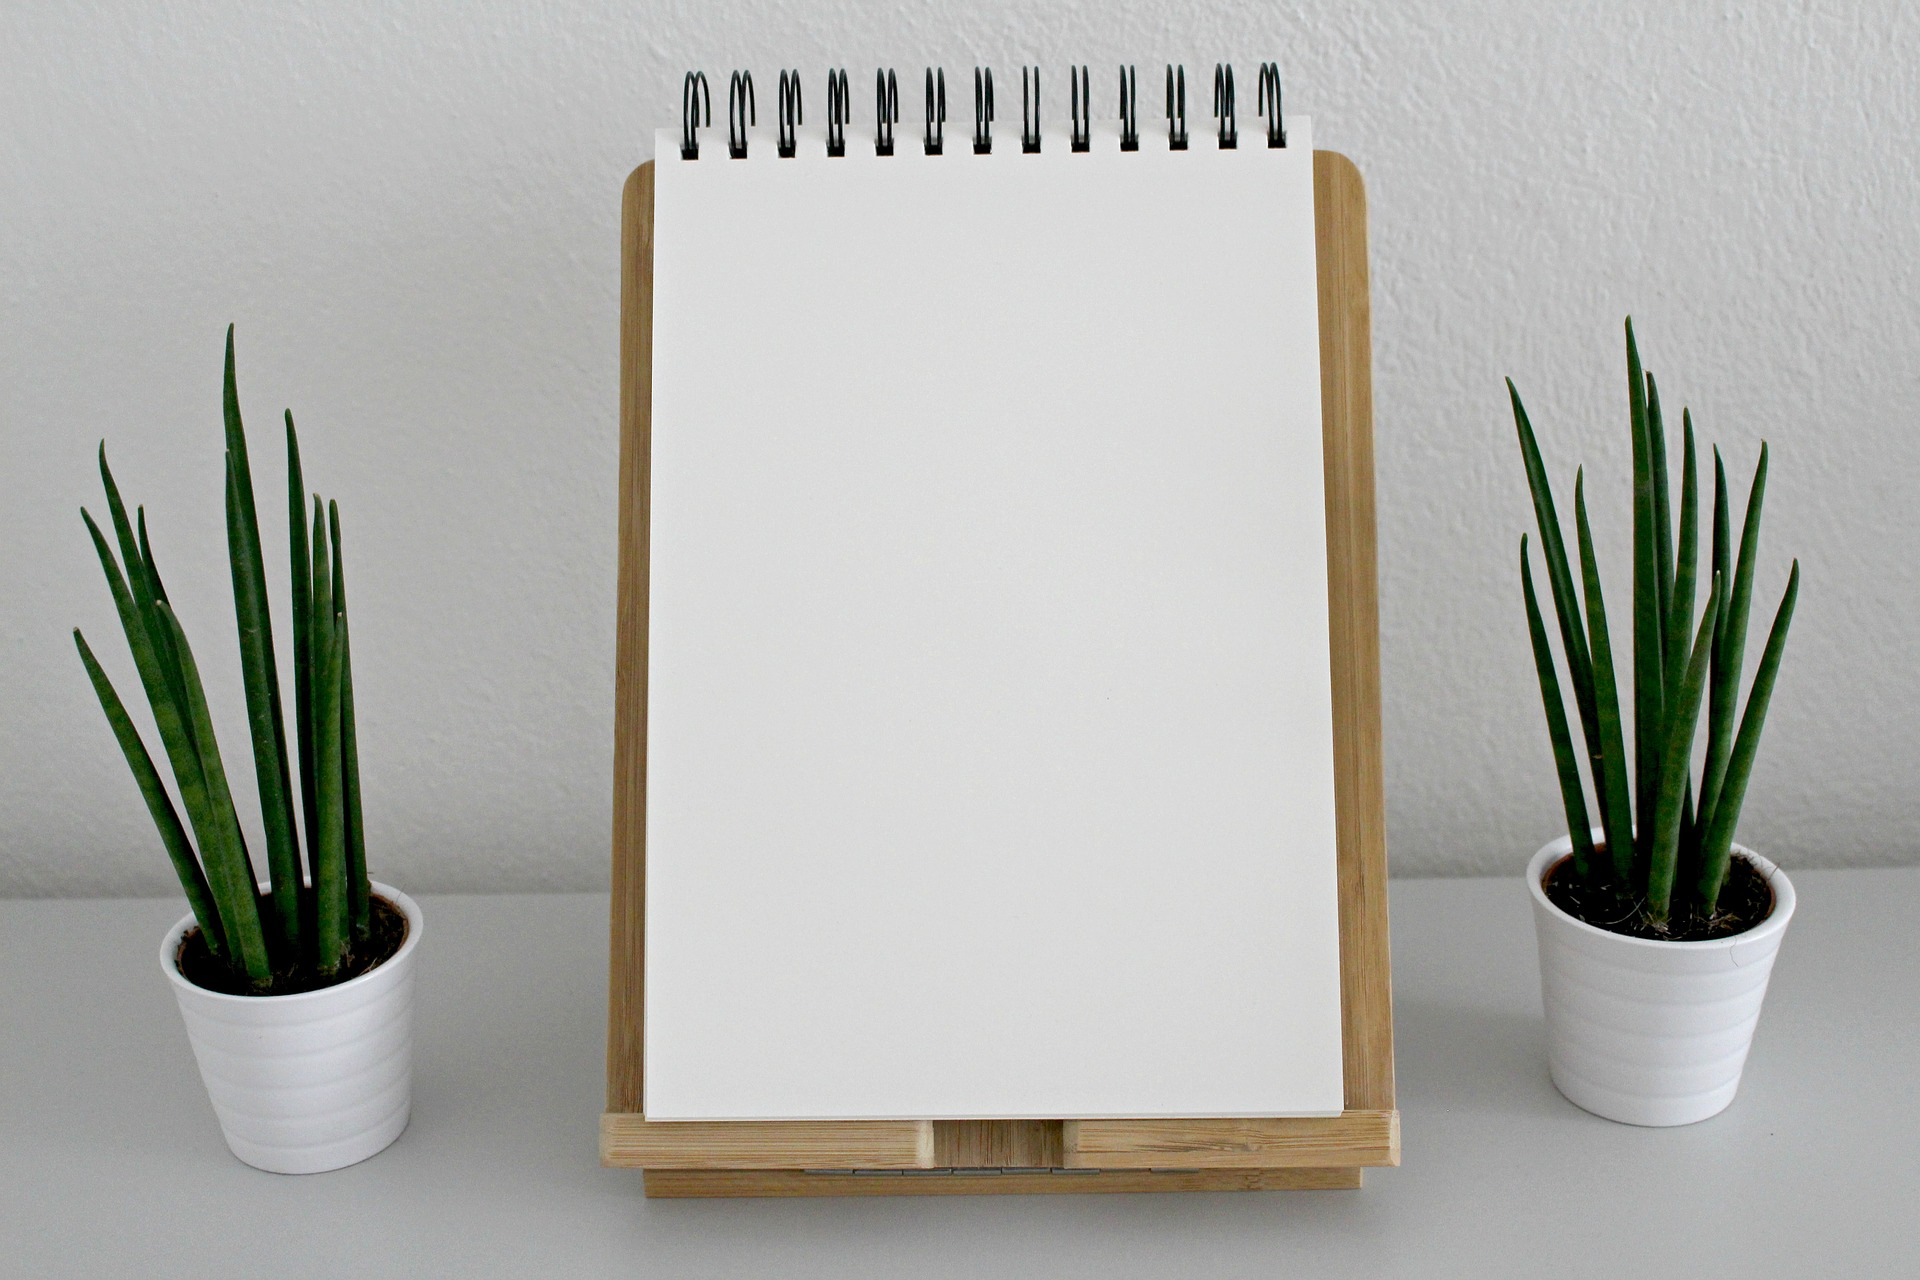 notebook-2465914_1920.jpg